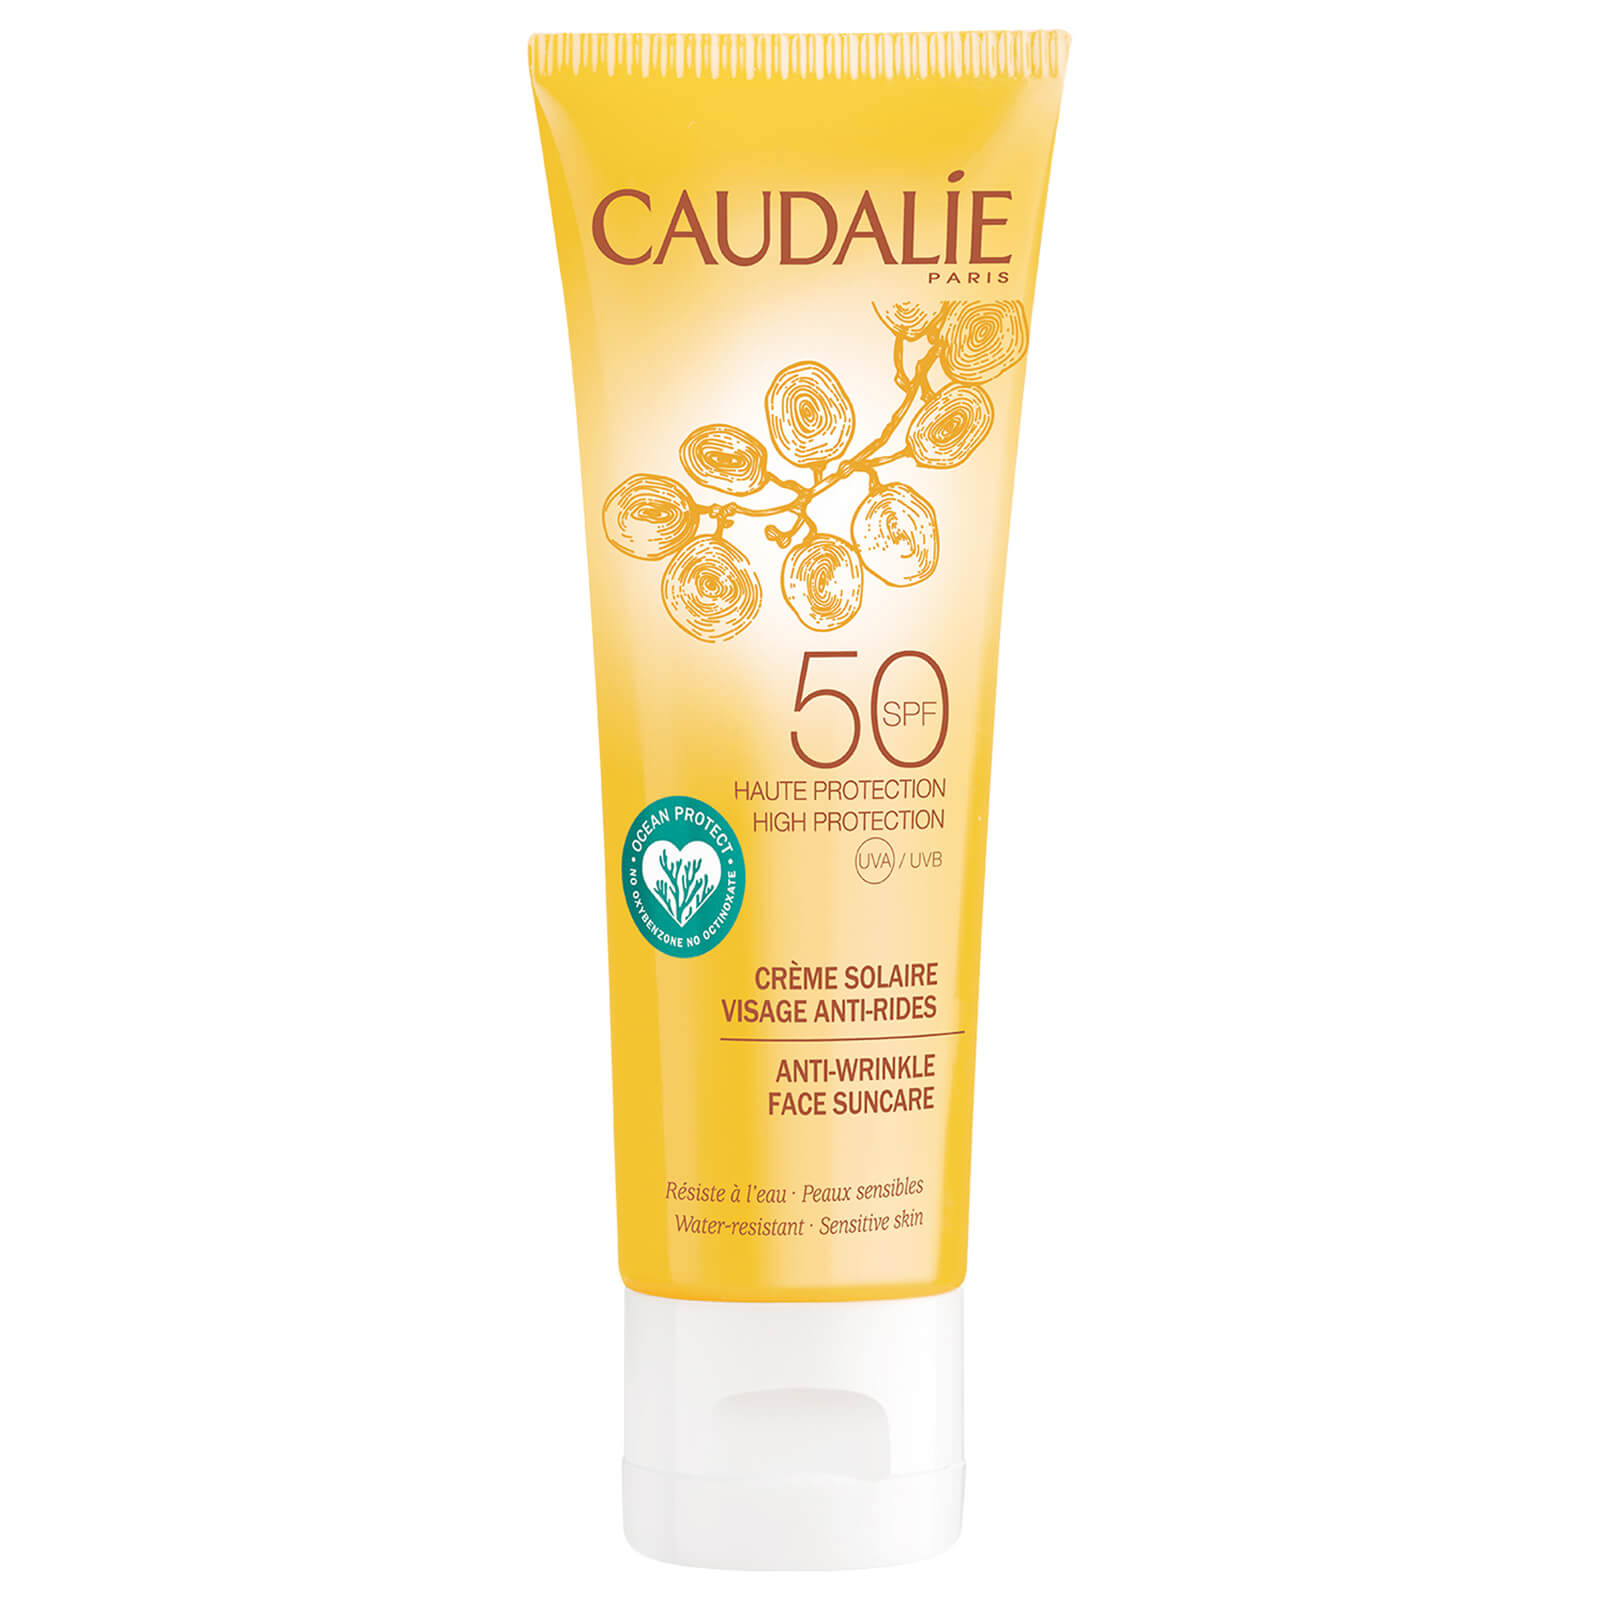 Spf Caudalie Care 50 Face Lotion Sun Wrinkle Anti 50mlFree 5AL34jRq